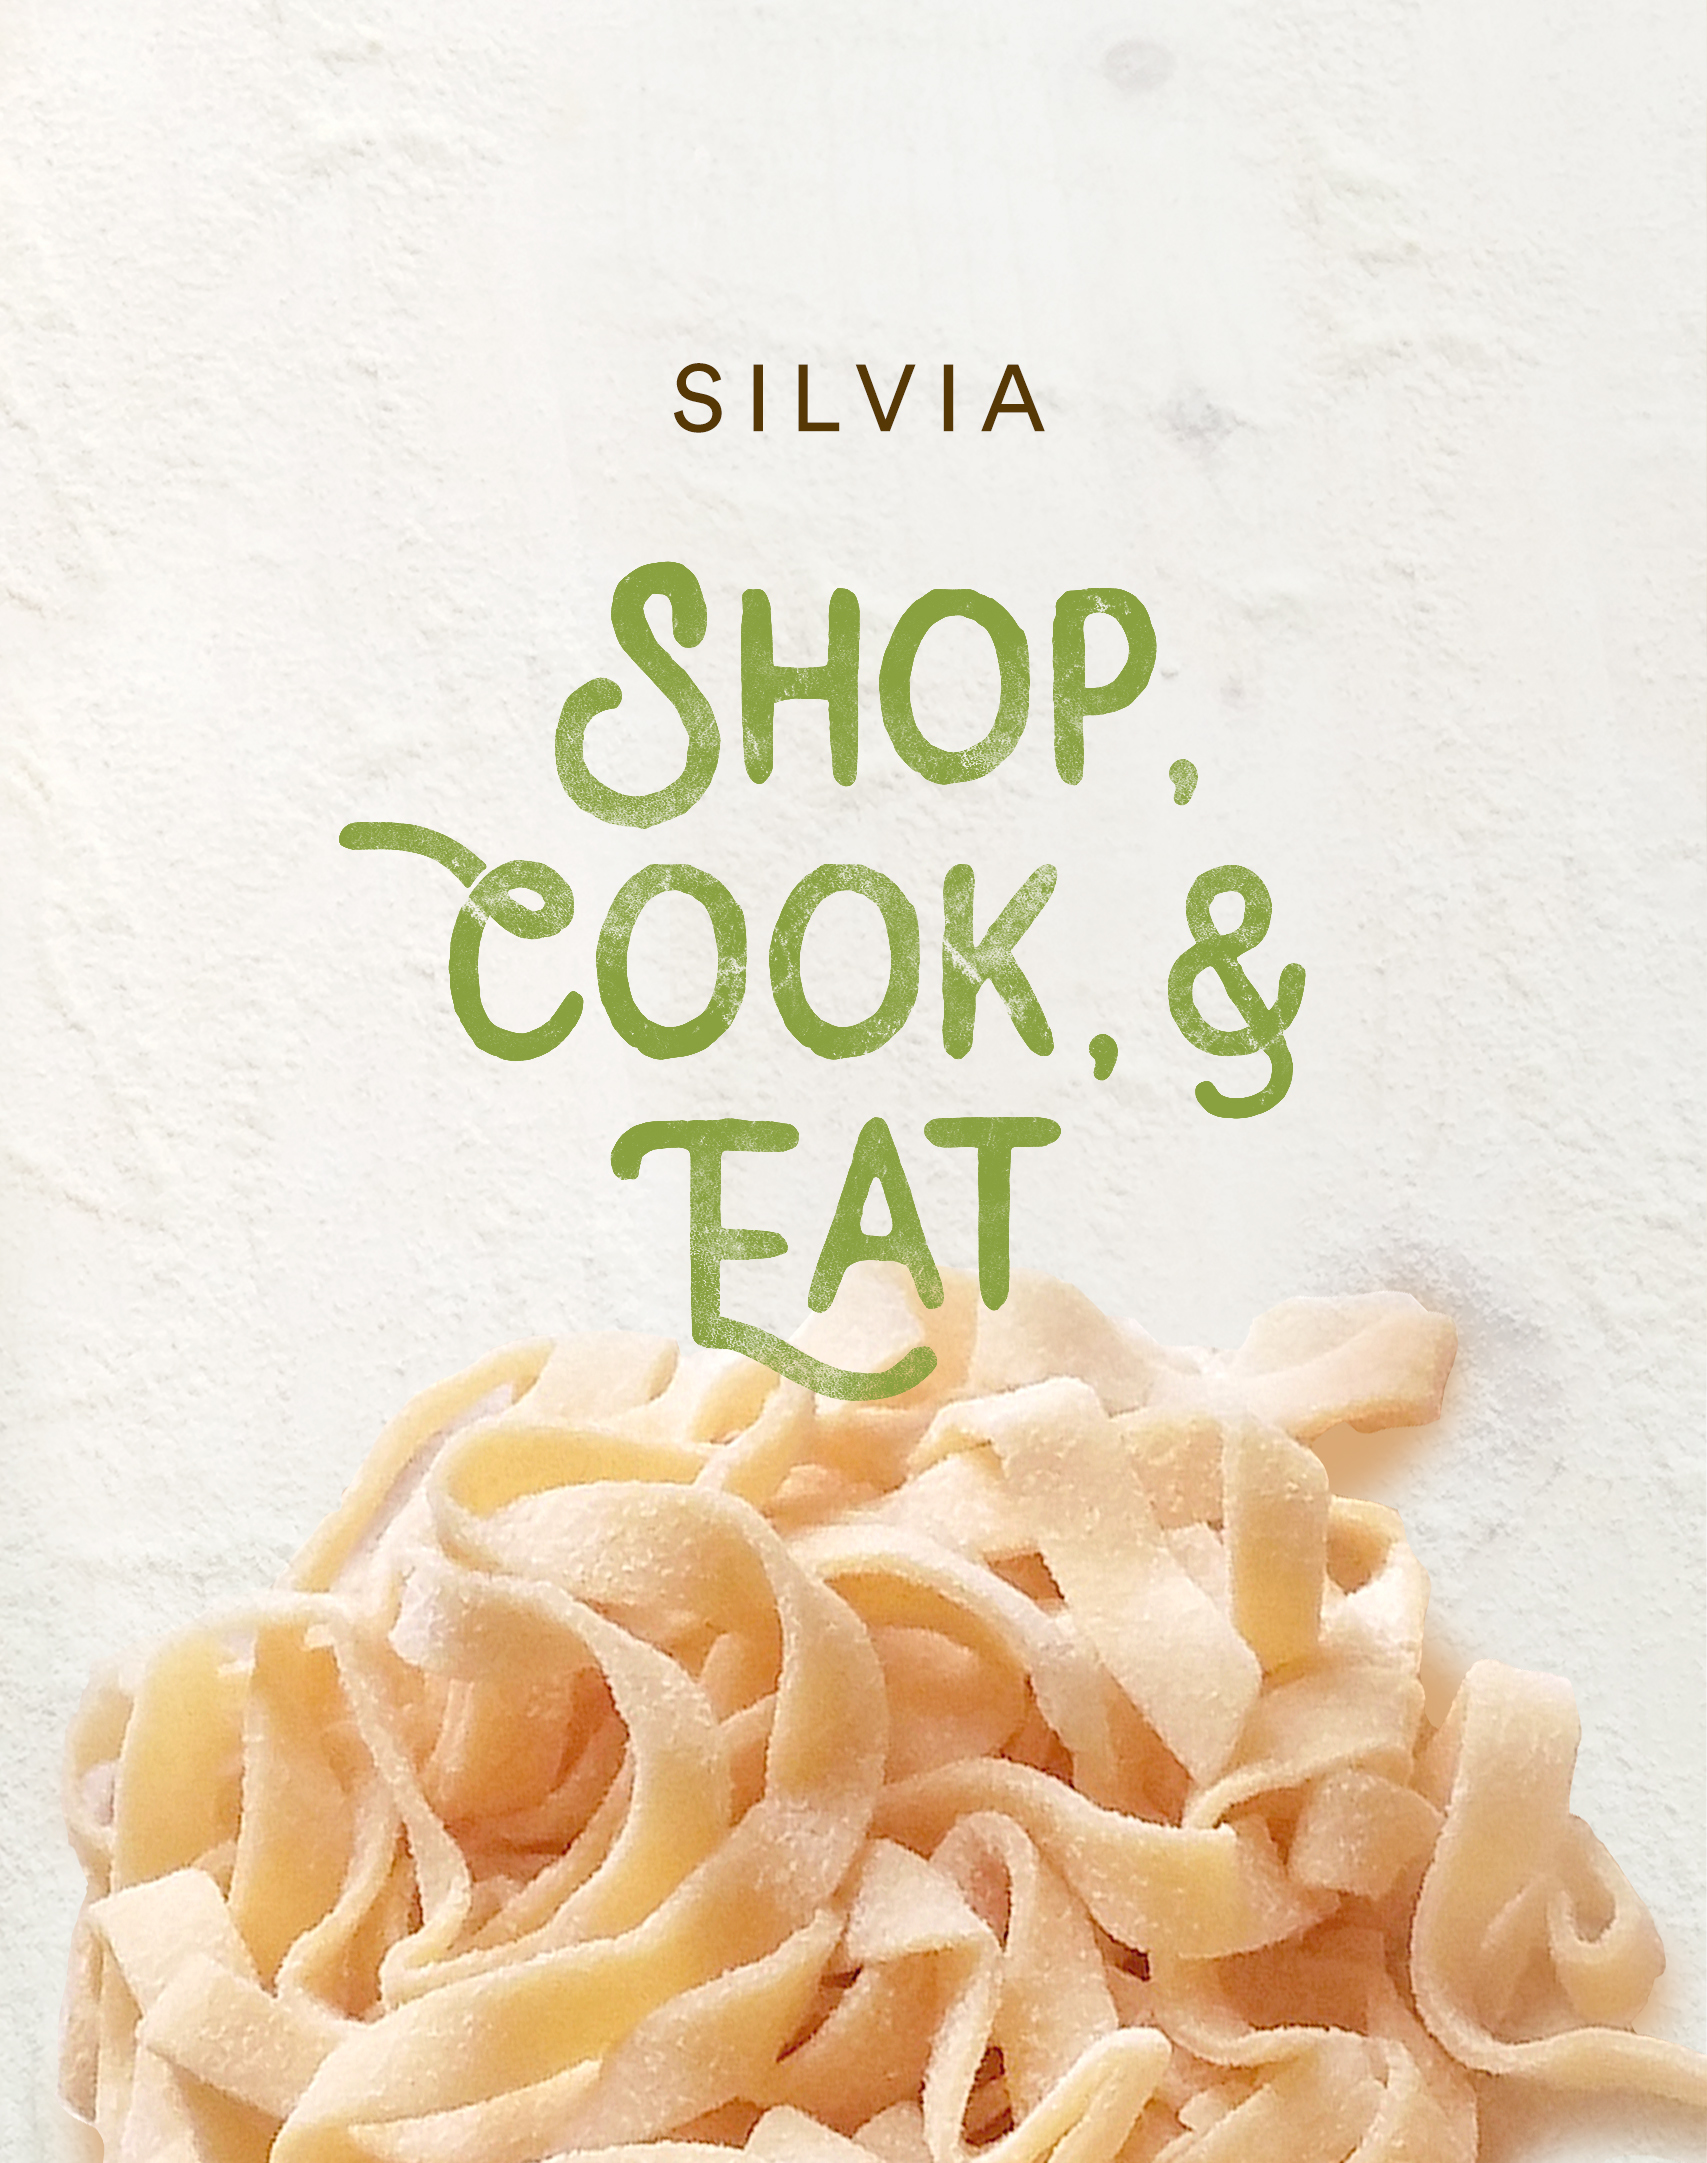 Rome – Silvia, Shop, Cook & Eat 6